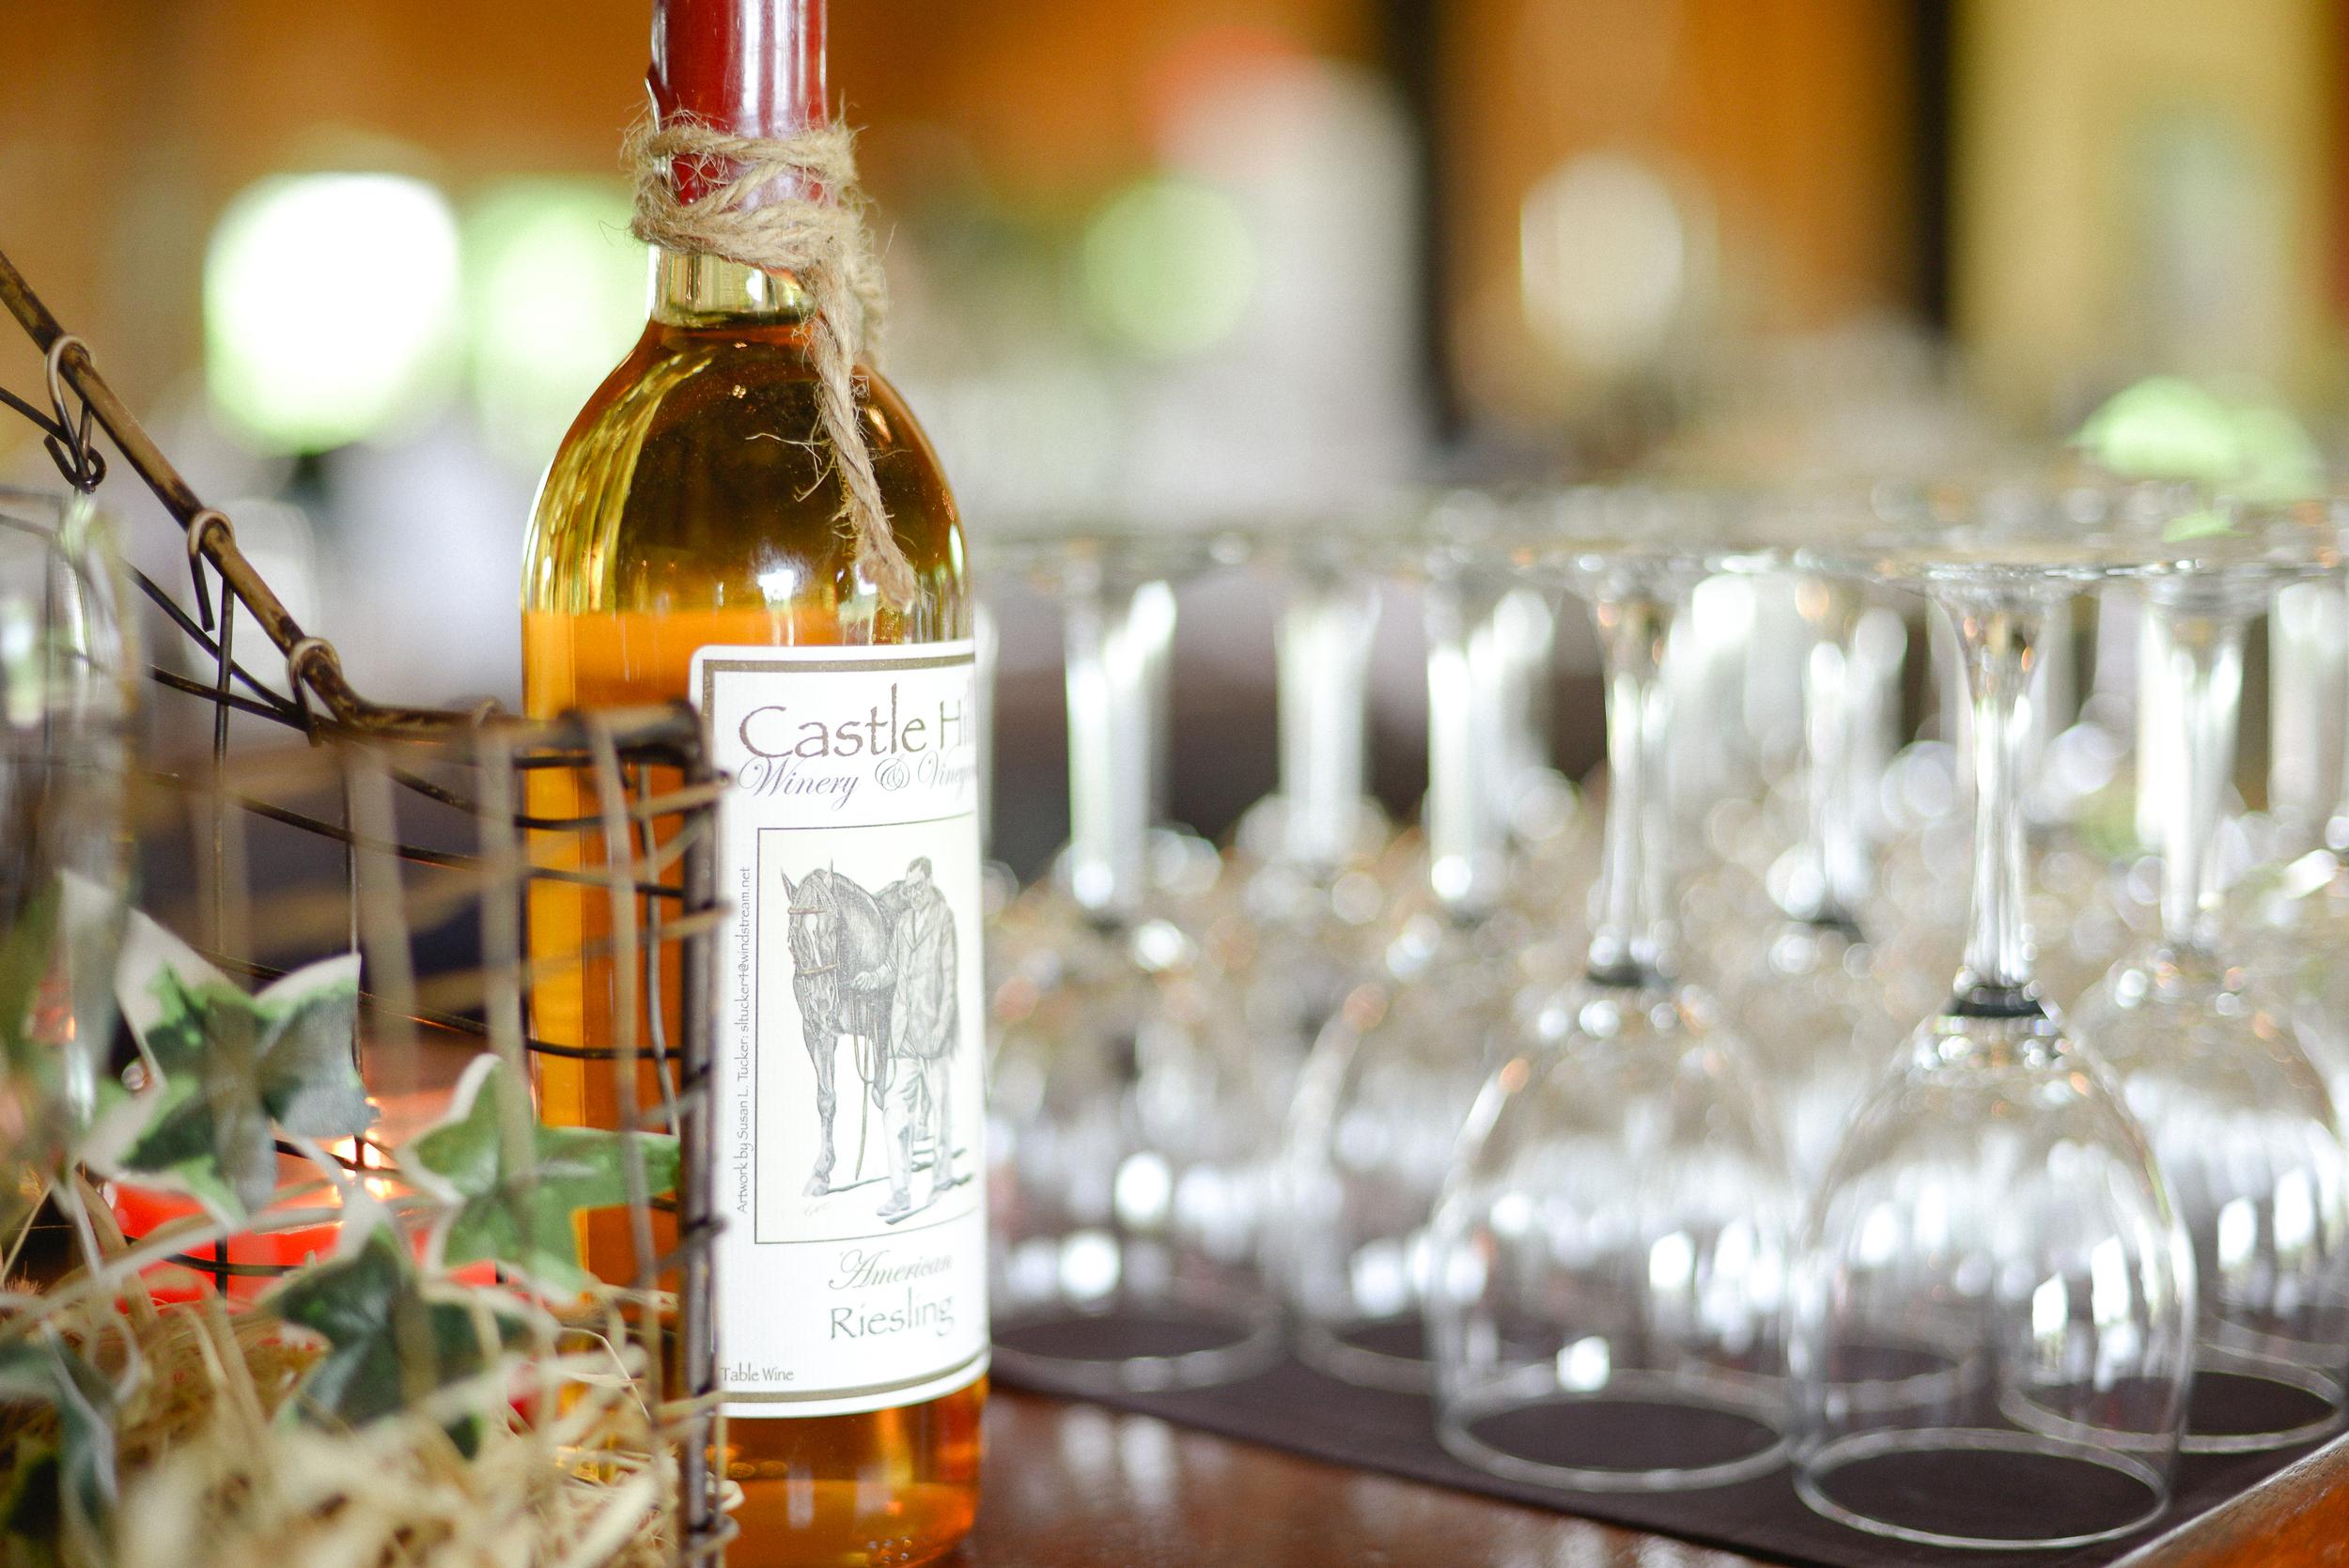 Castle Hil Winery pics